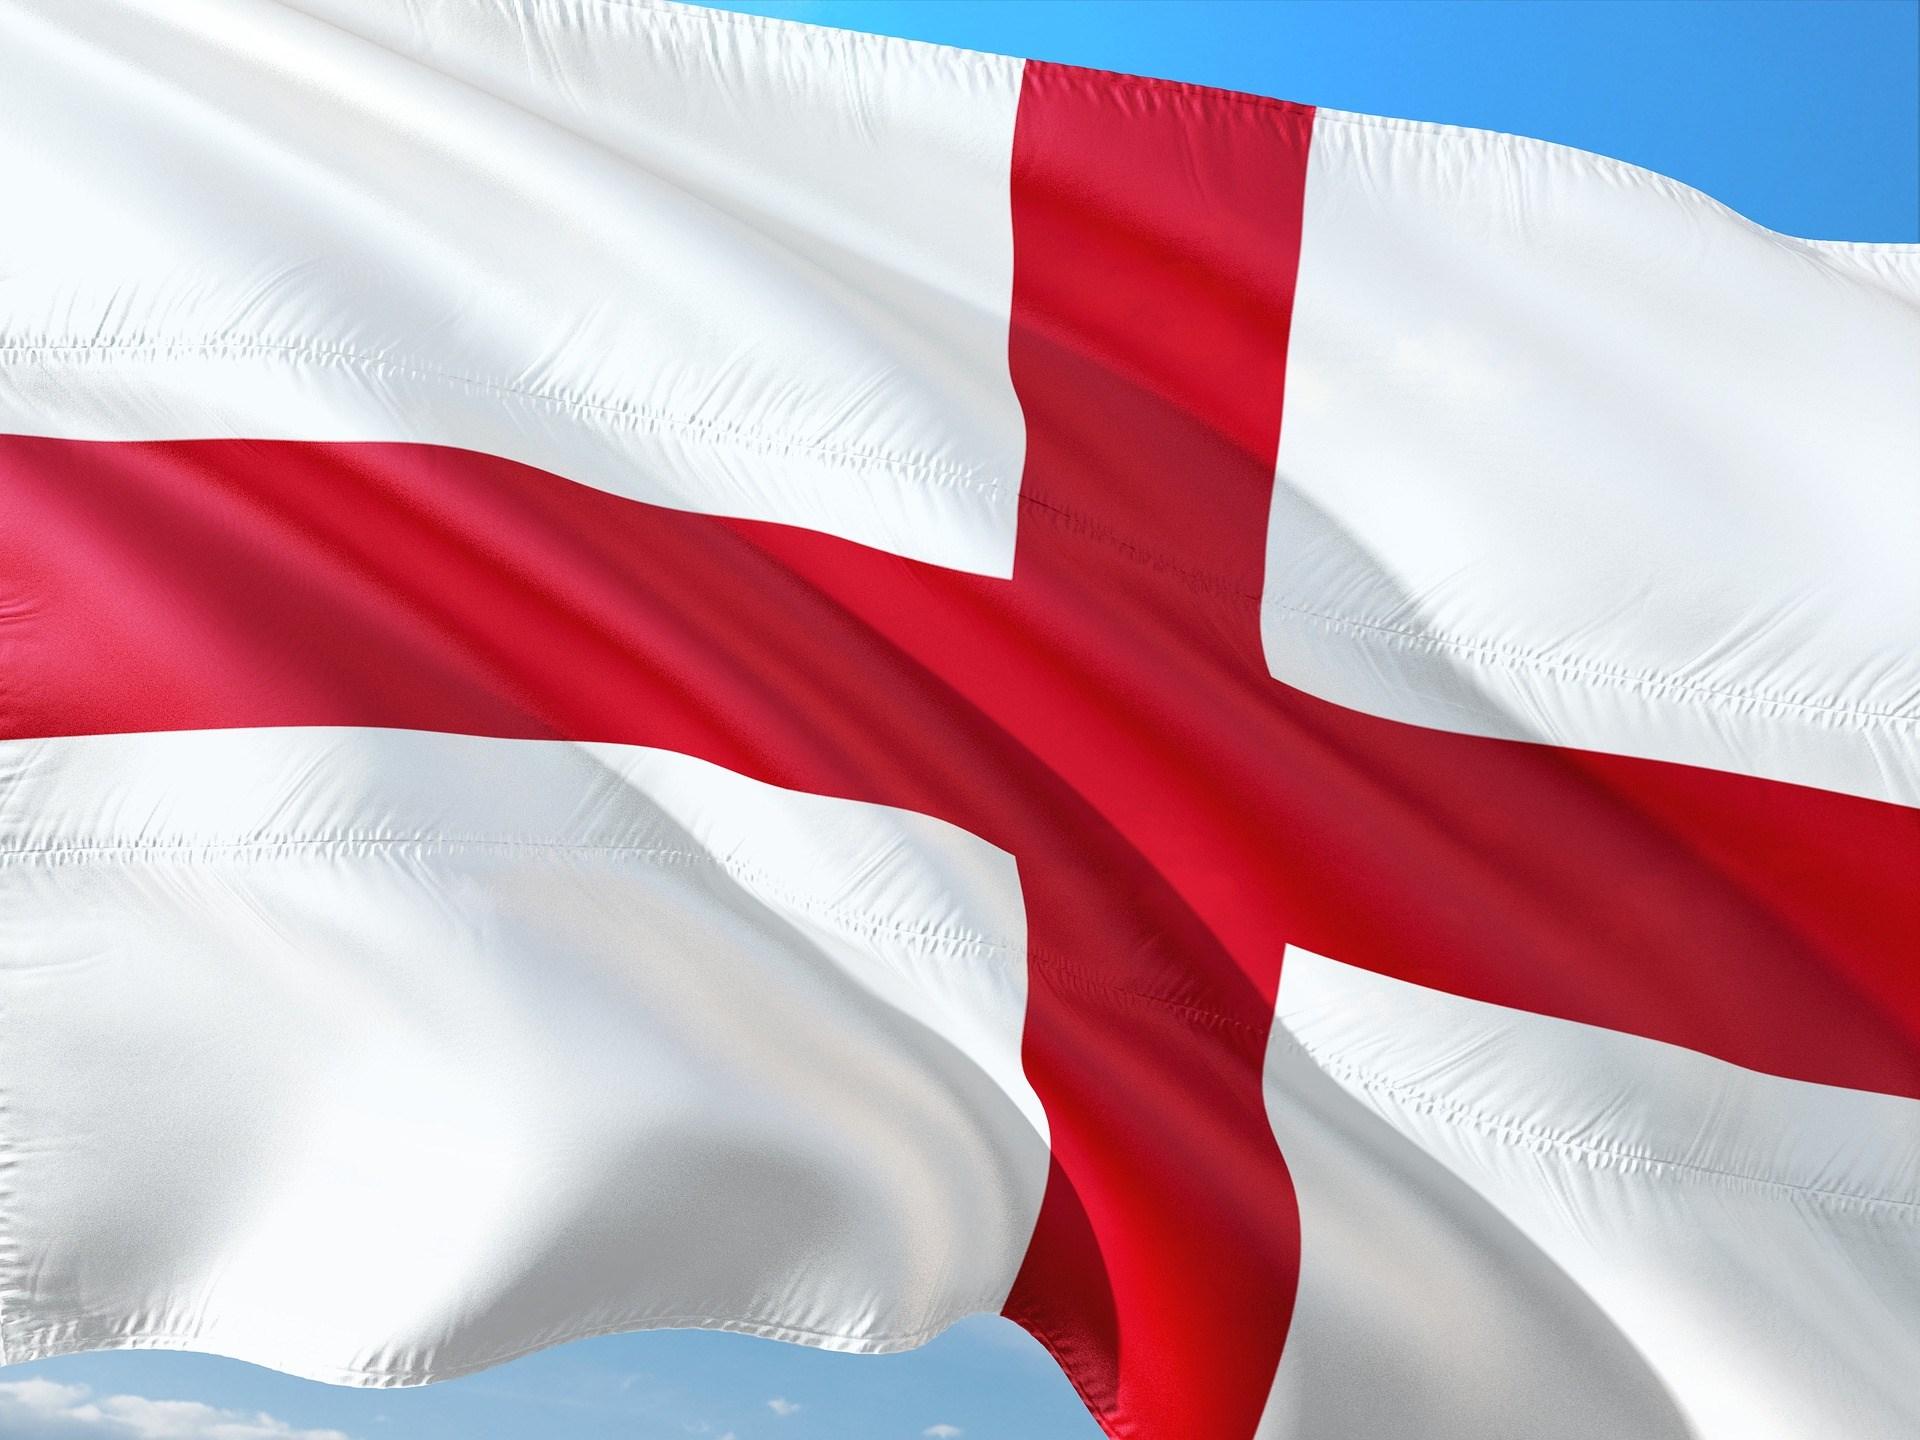 England U21 v Poland U21 (UEFA Under-21 Championship)